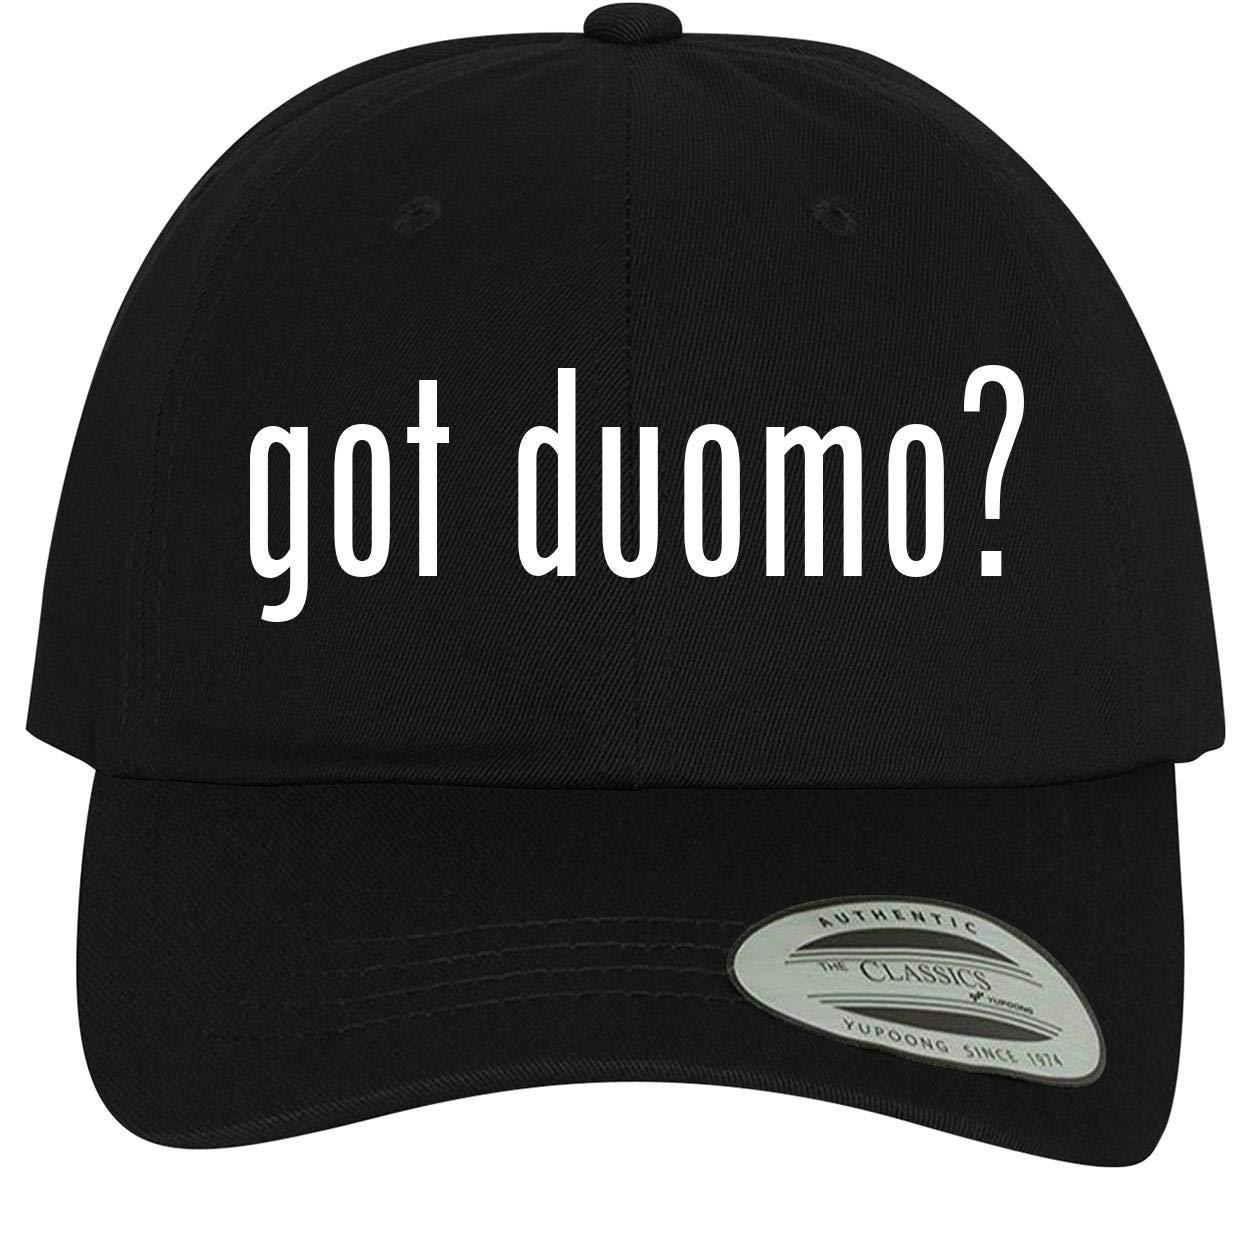 BH Cool Designs got Duomo? - Comfortable Dad Hat Baseball Cap